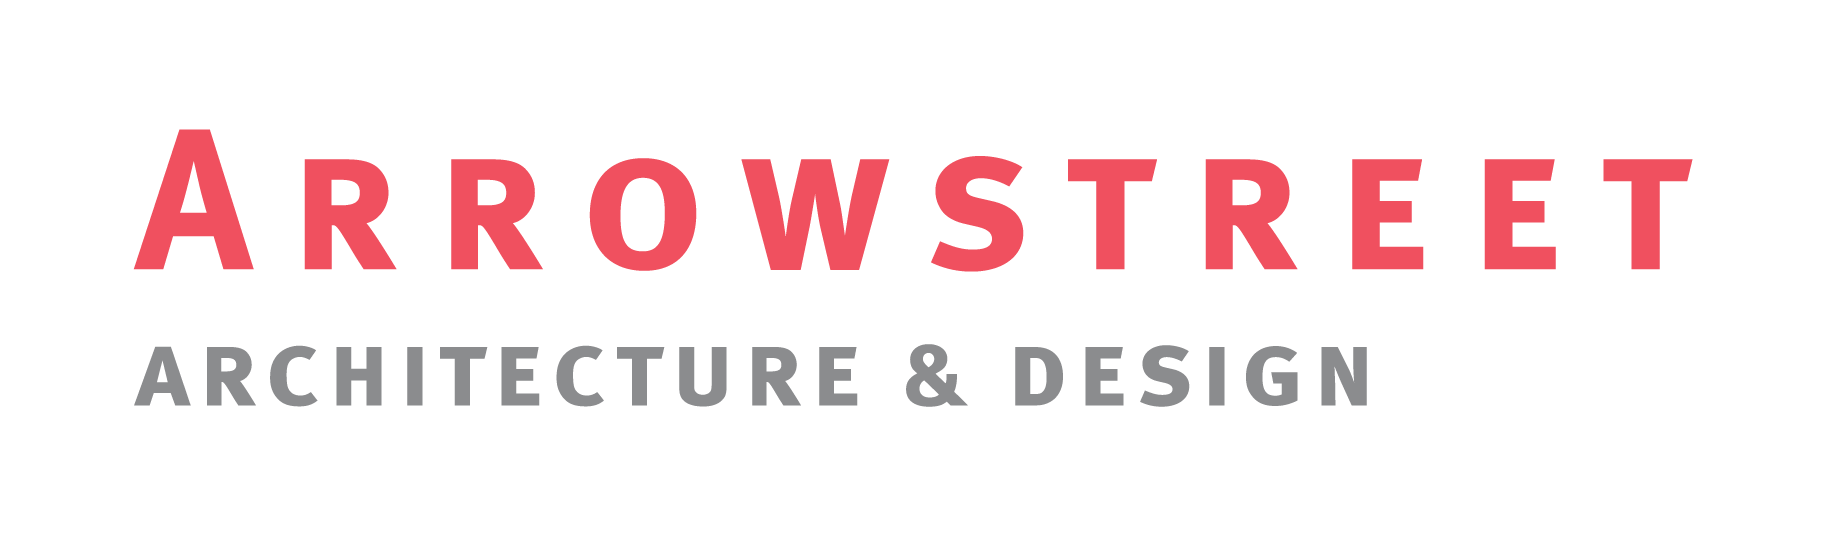 AST Logo w AD Stack PMS185 9 U